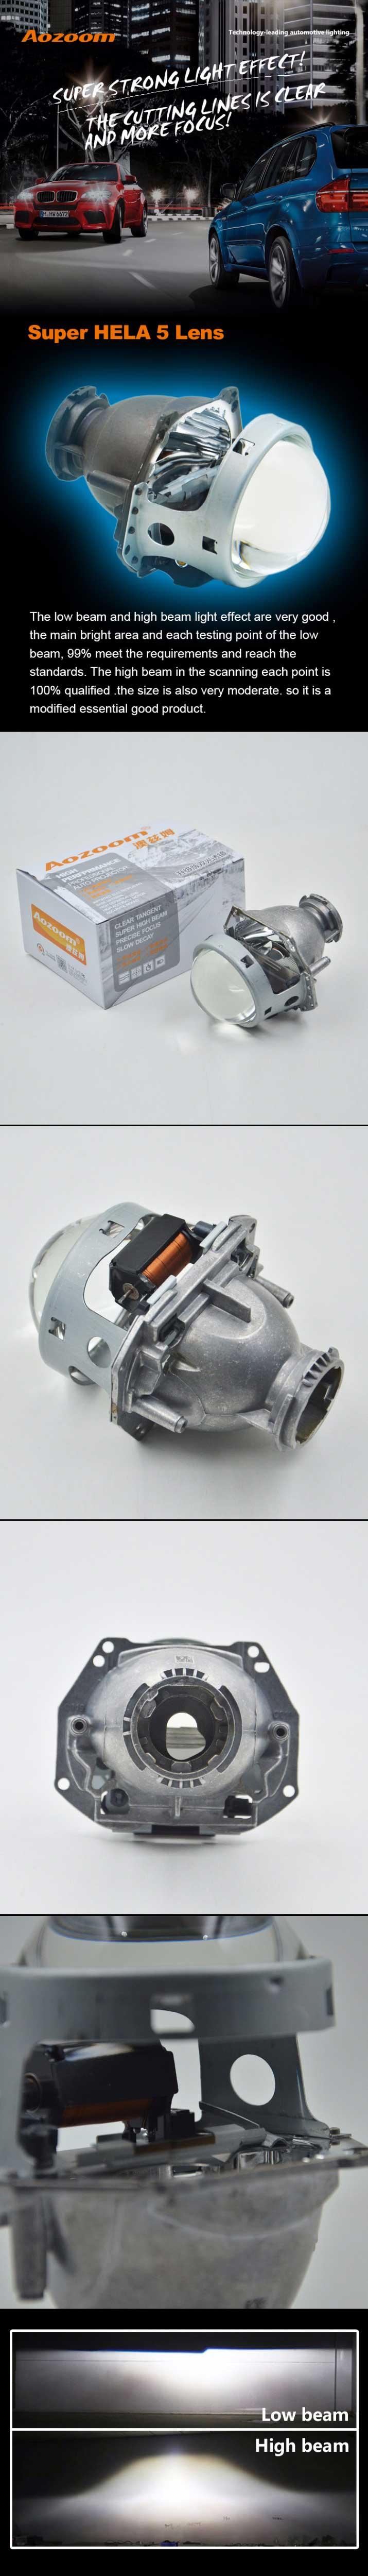 Hela 5 3-Inch Bi-Xenon Projector Headlight